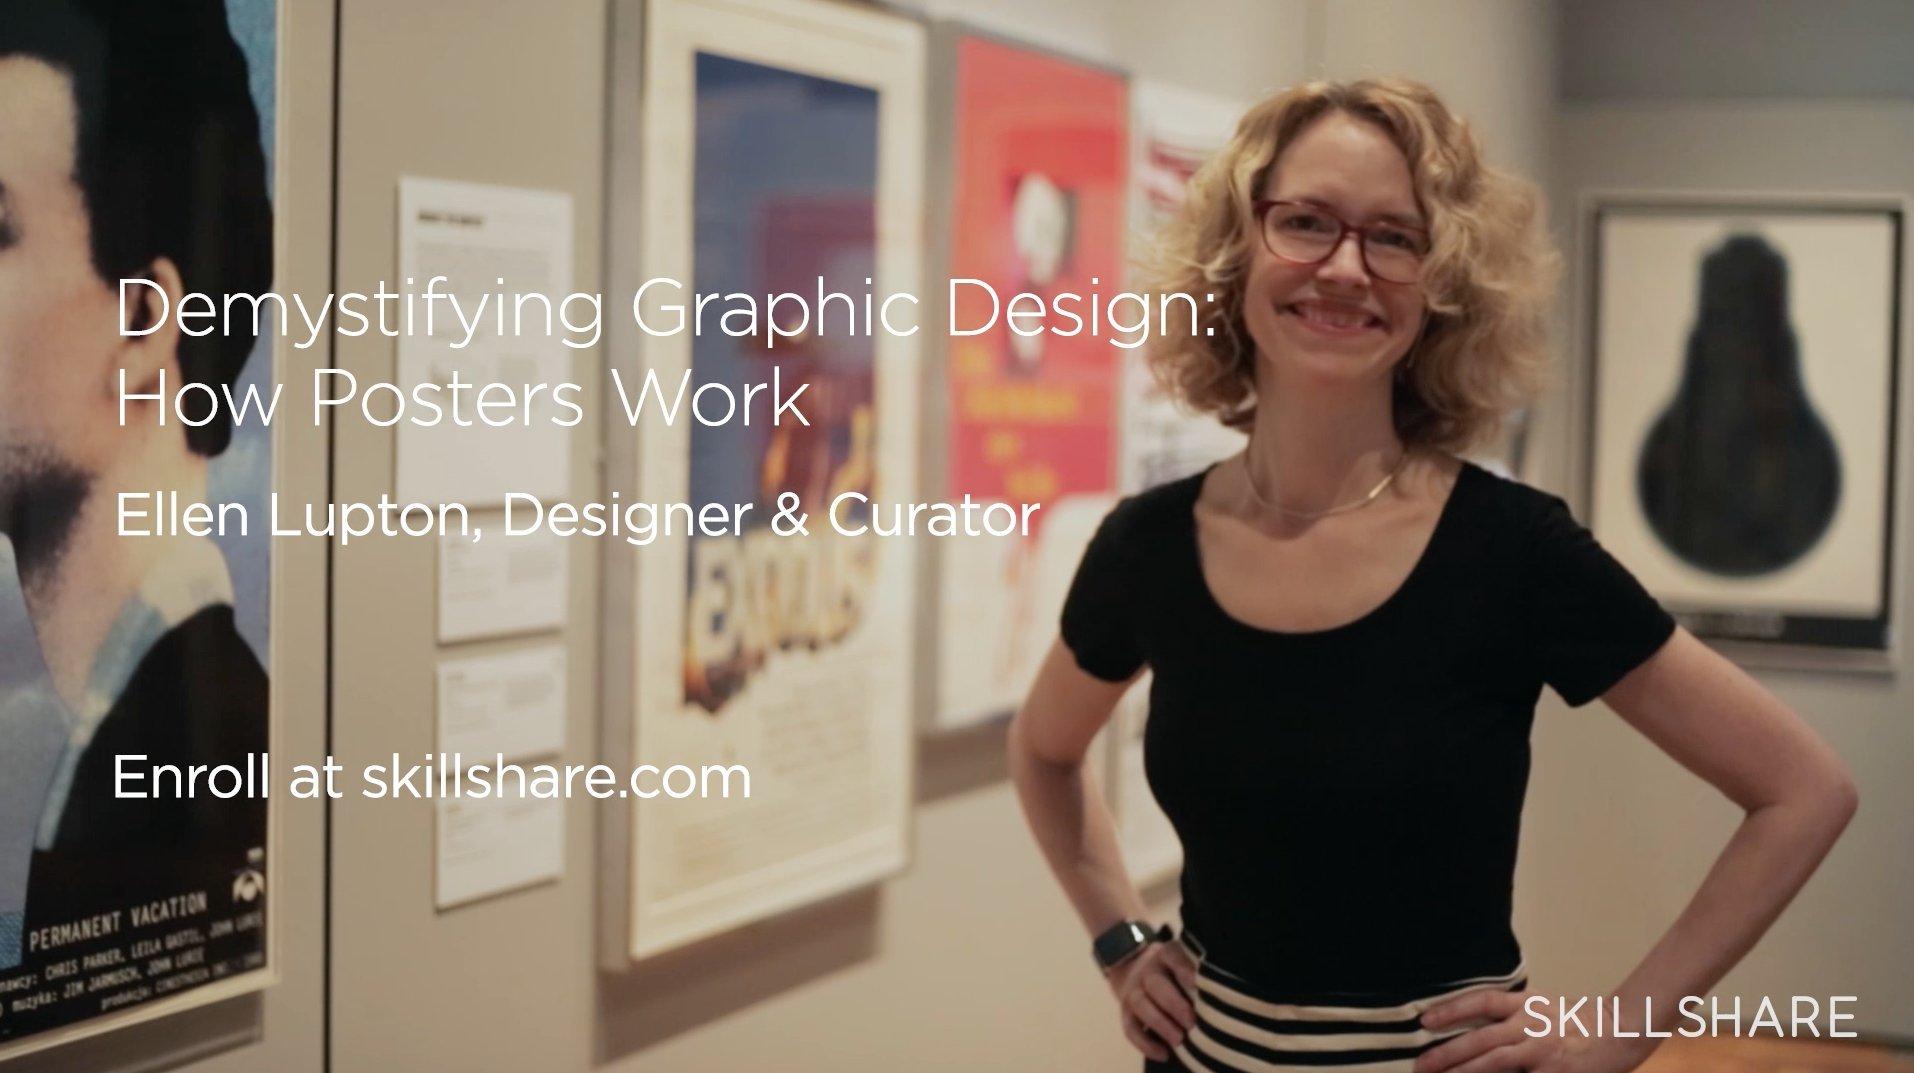 Demystifying Graphic Design: How Posters Work | Ellen Lupton